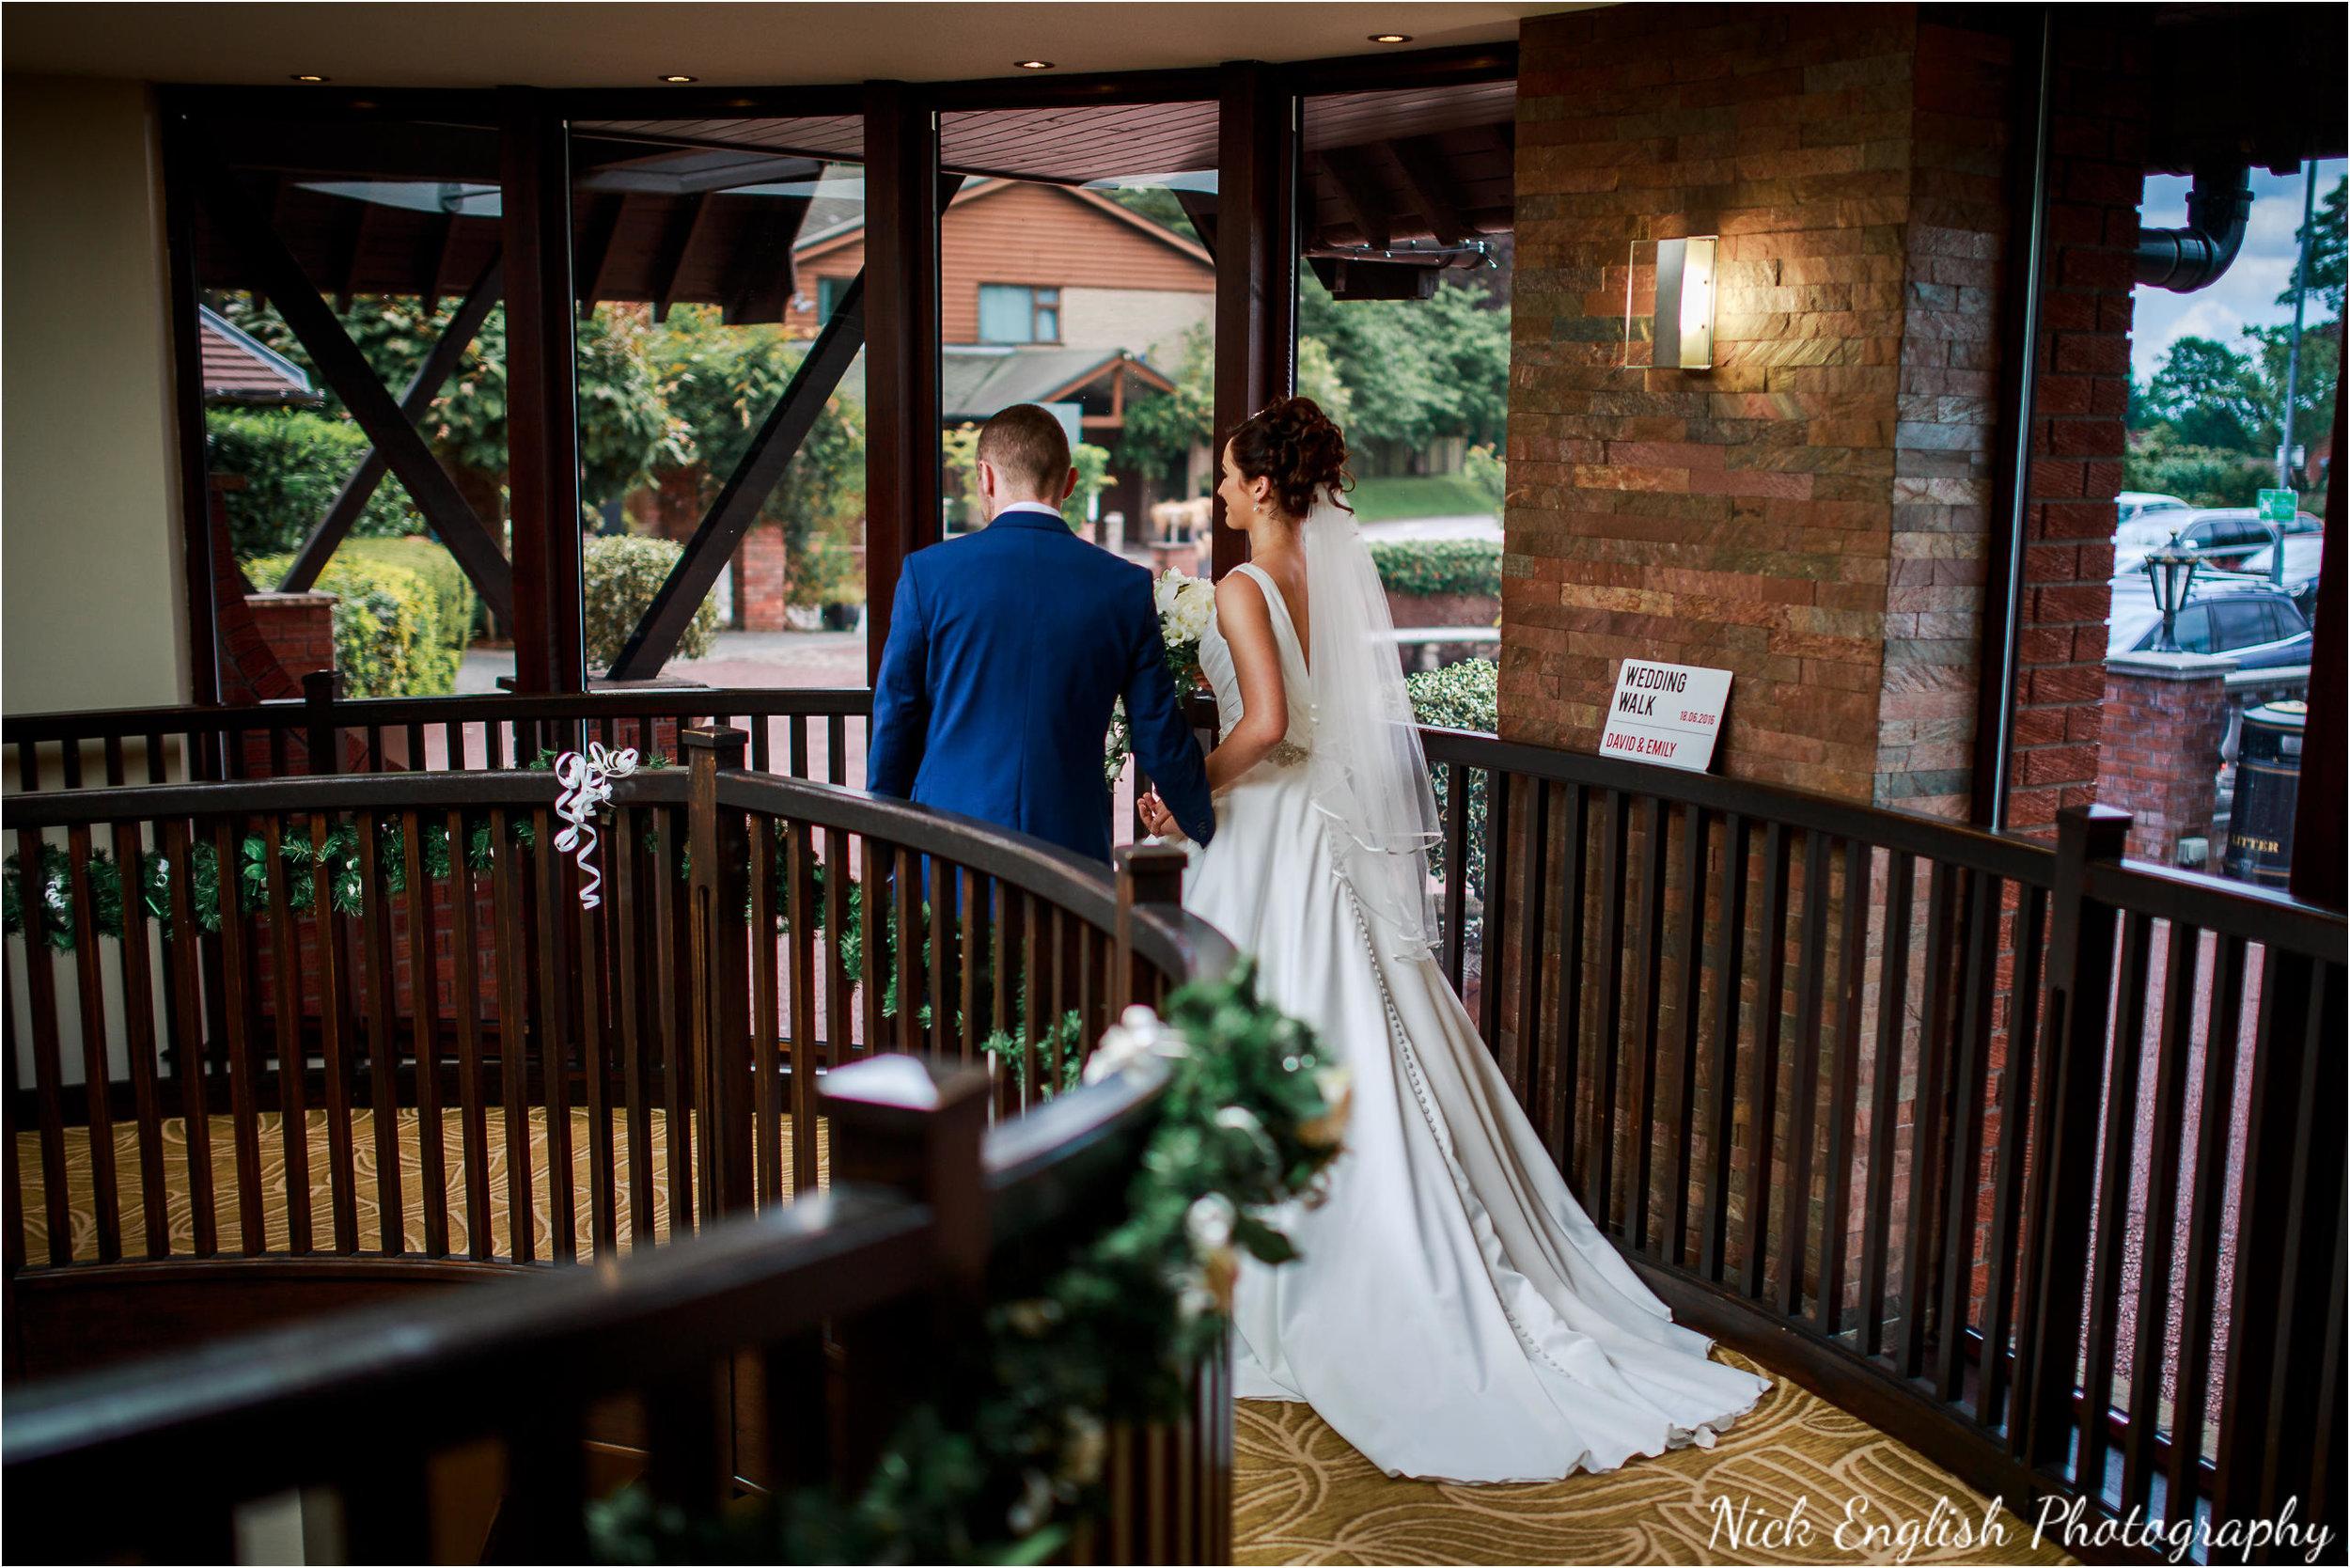 Emily David Wedding Photographs at Barton Grange Preston by Nick English Photography 83jpg.jpeg